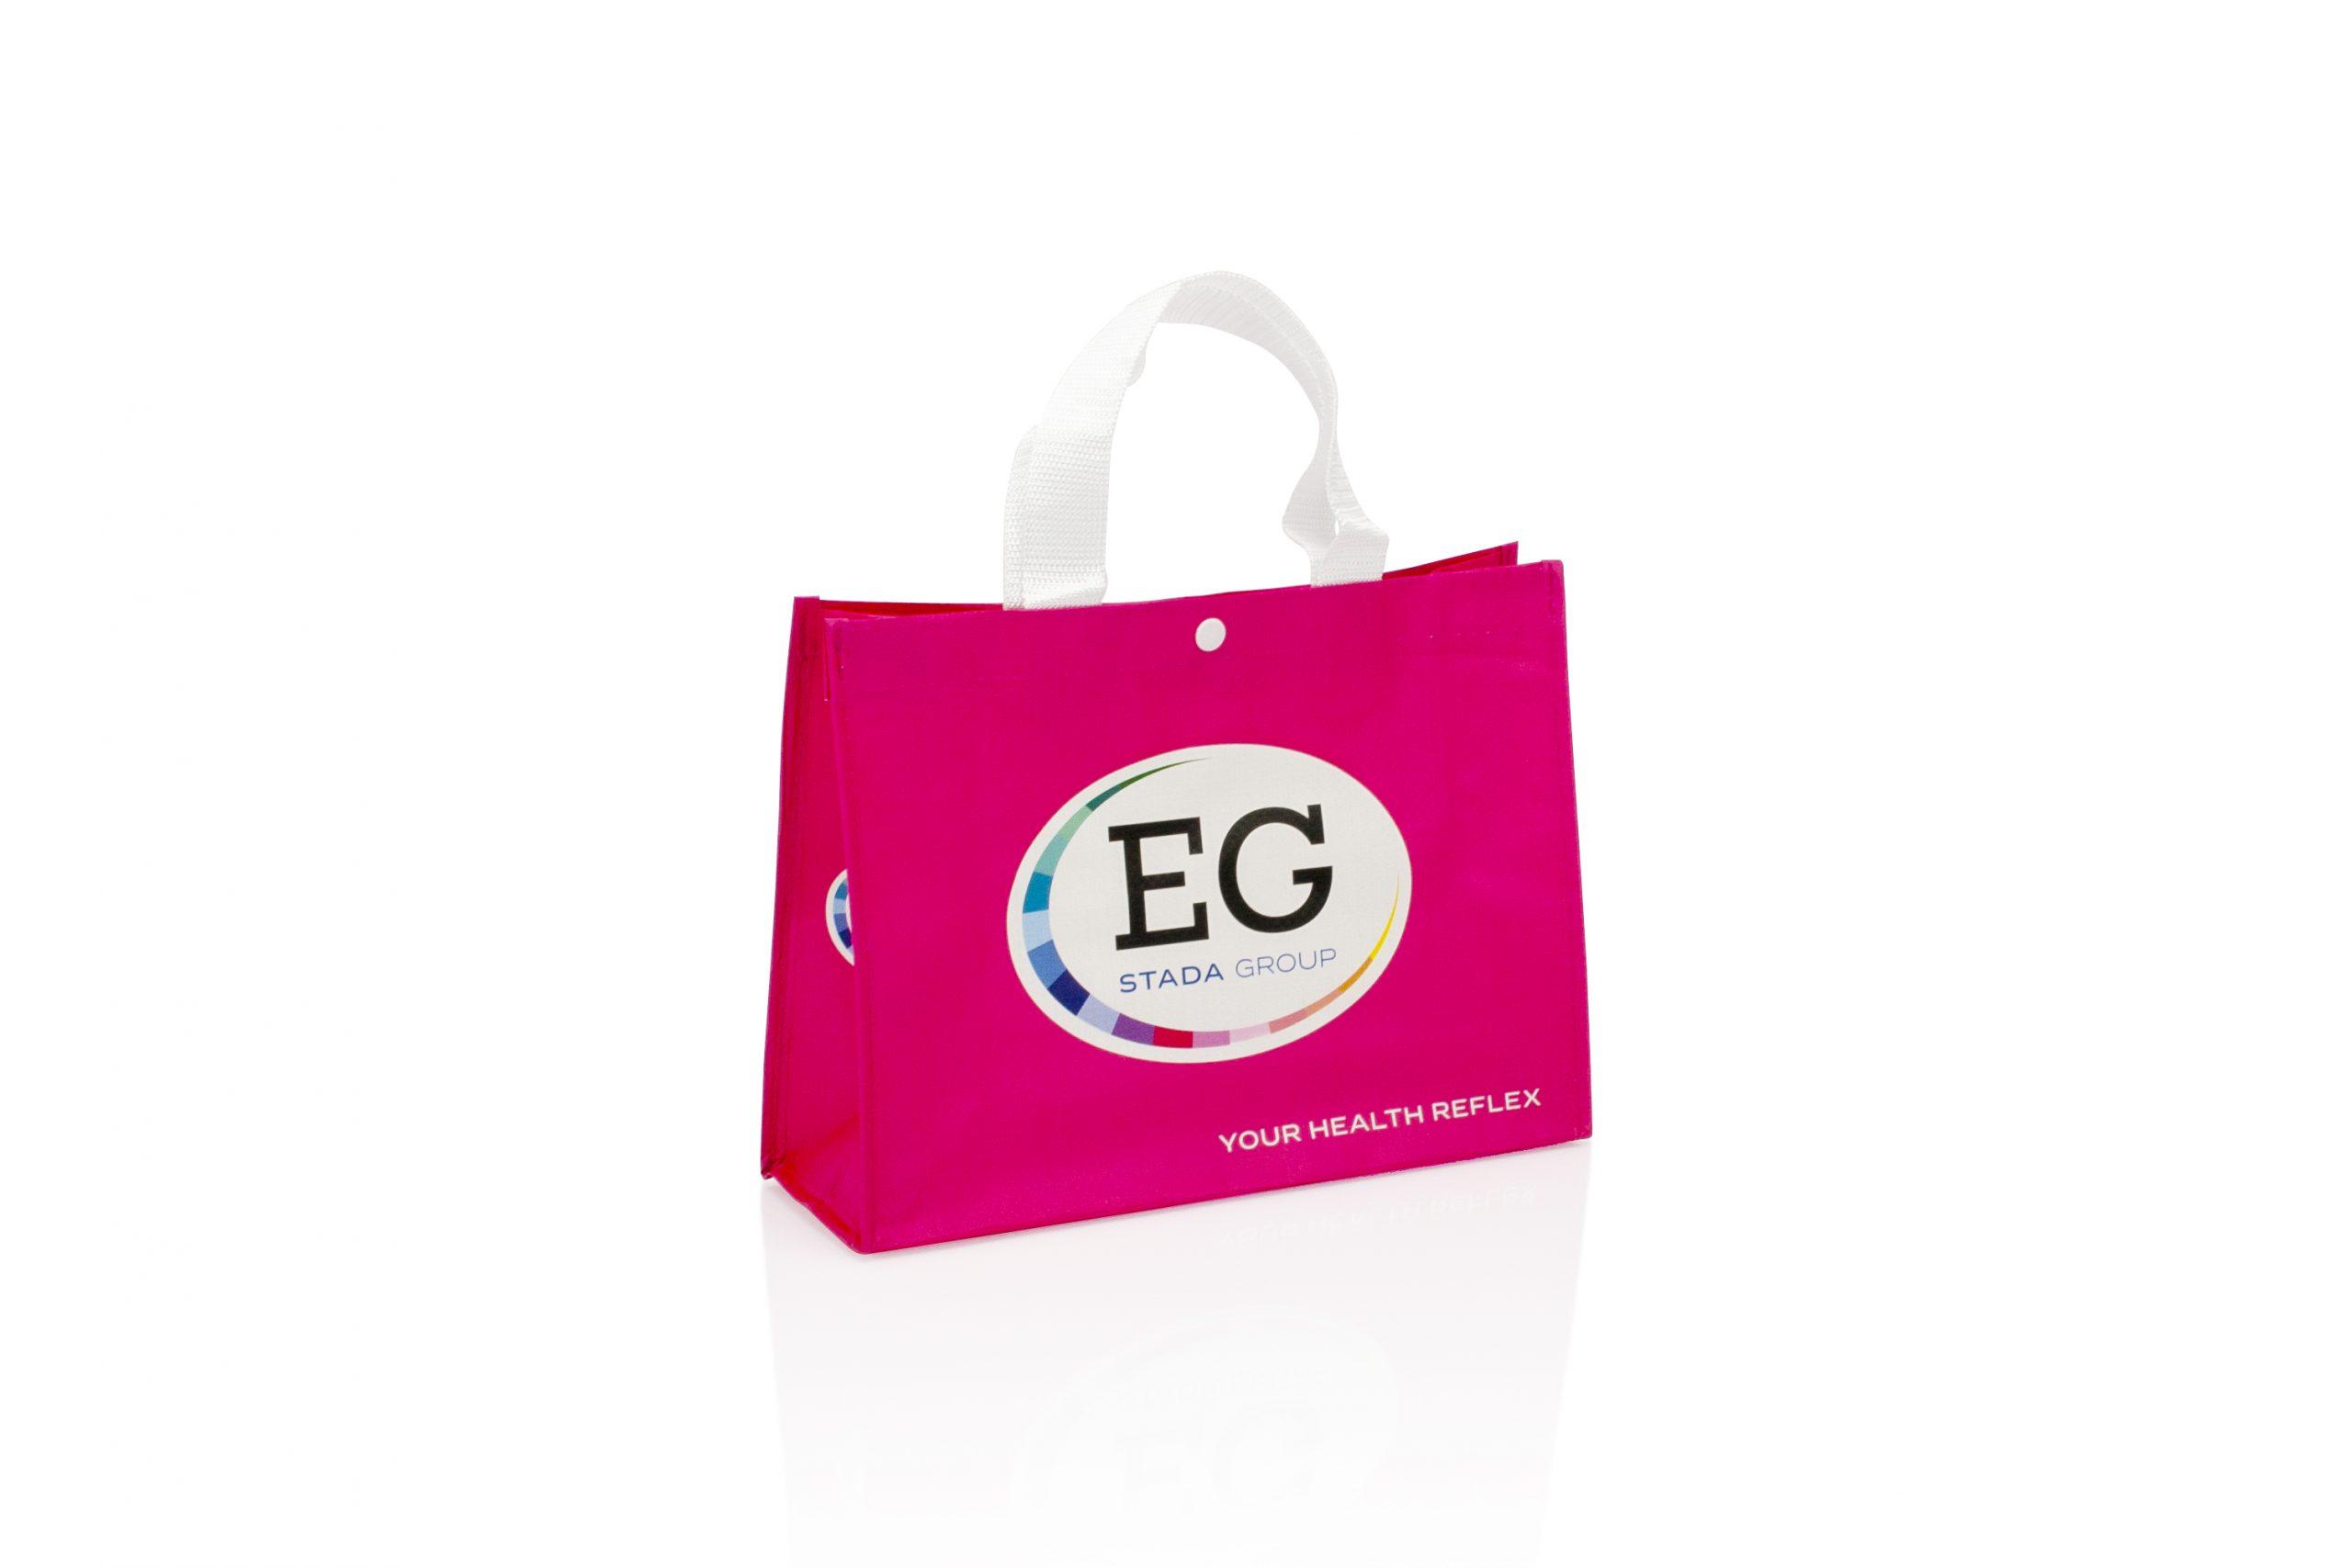 Herbruikbare shopper woven met logo